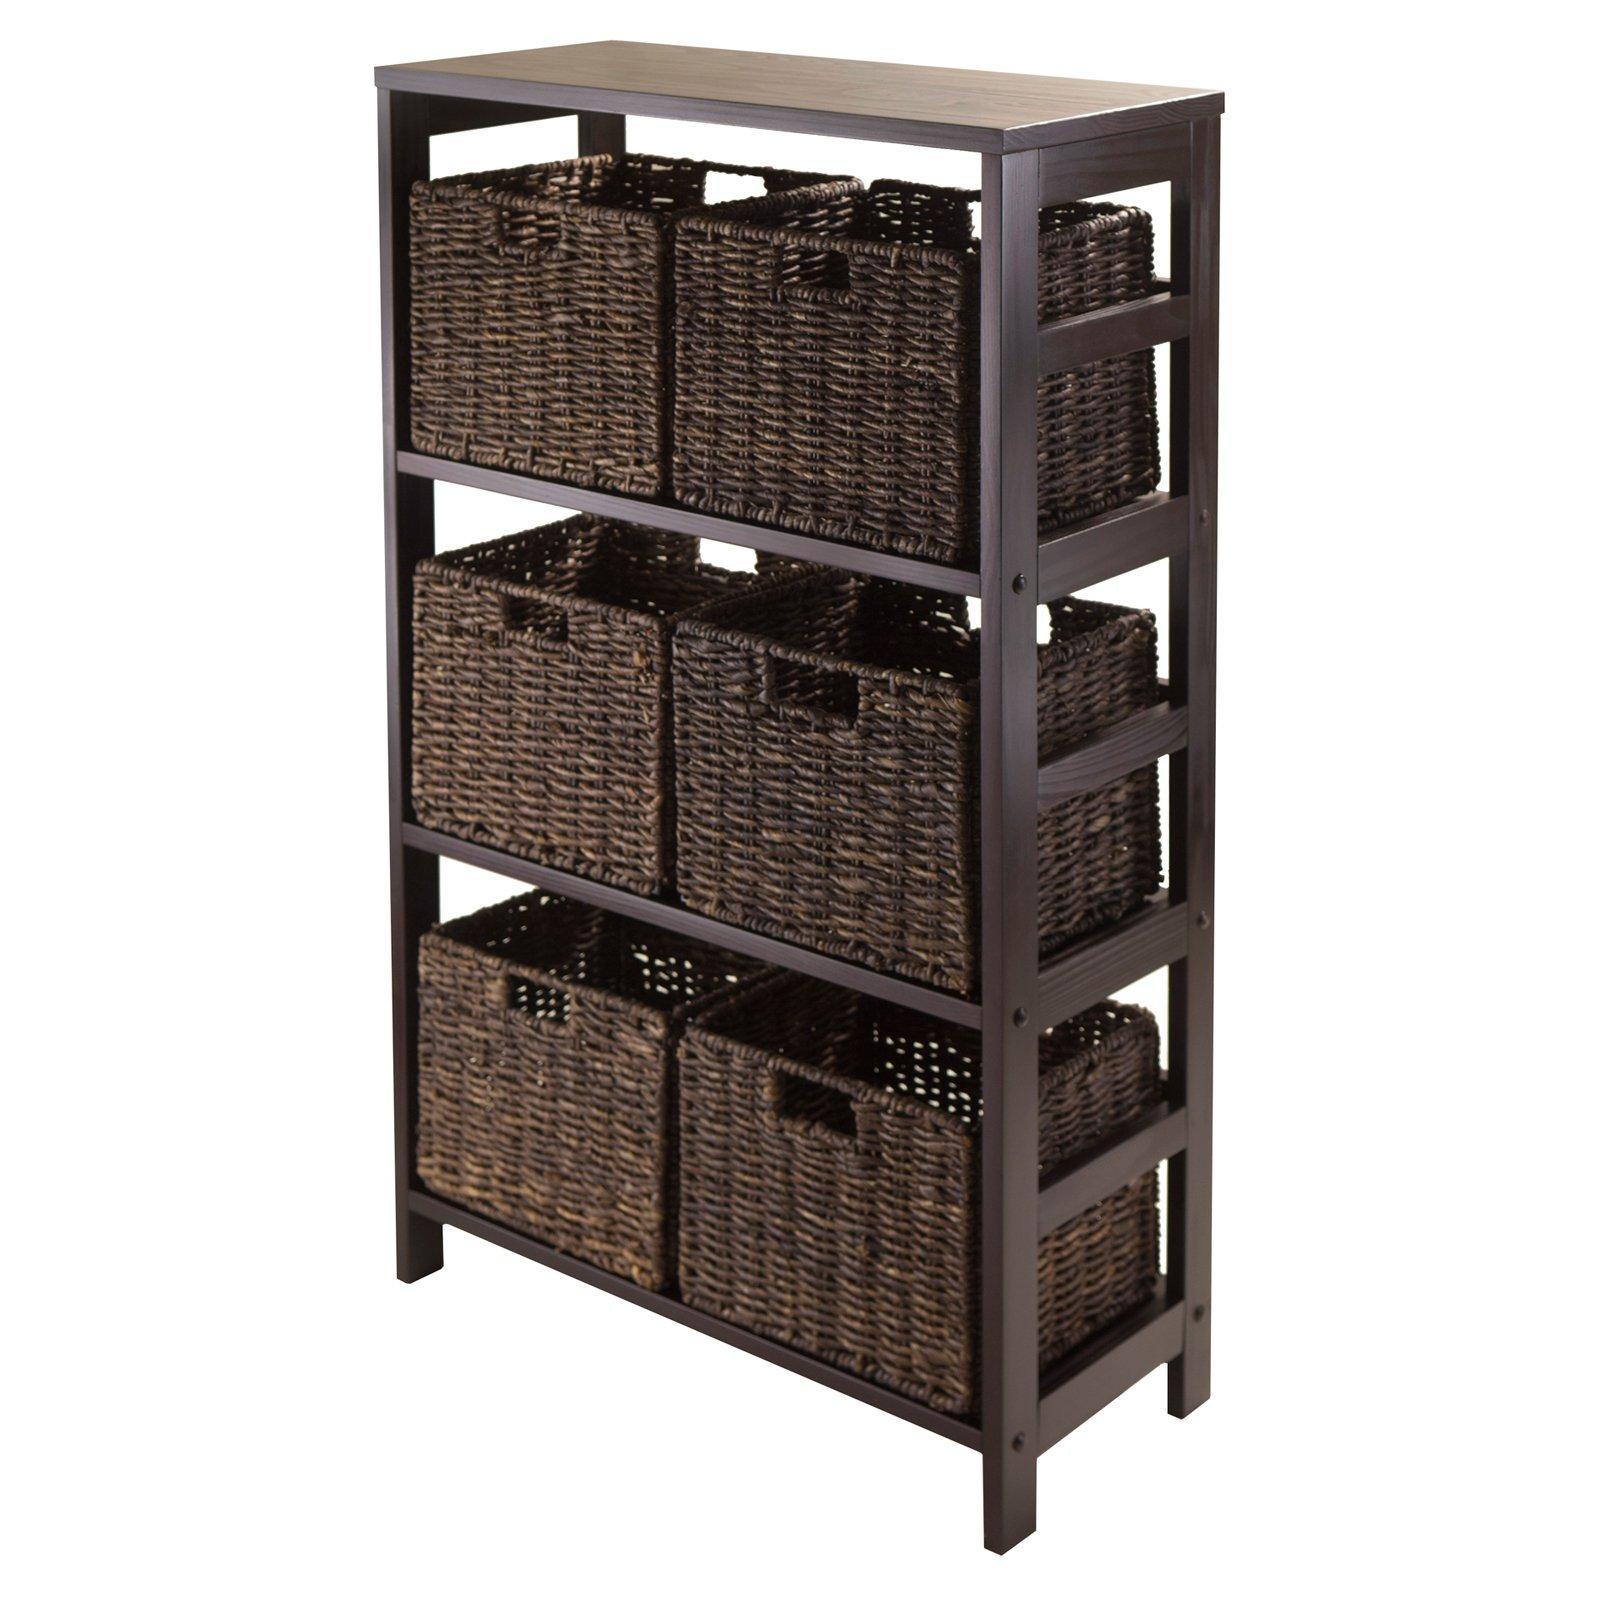 Winsome Wood Granville 7-PC Storage Shelf Set w/ Corn Husk Baskets